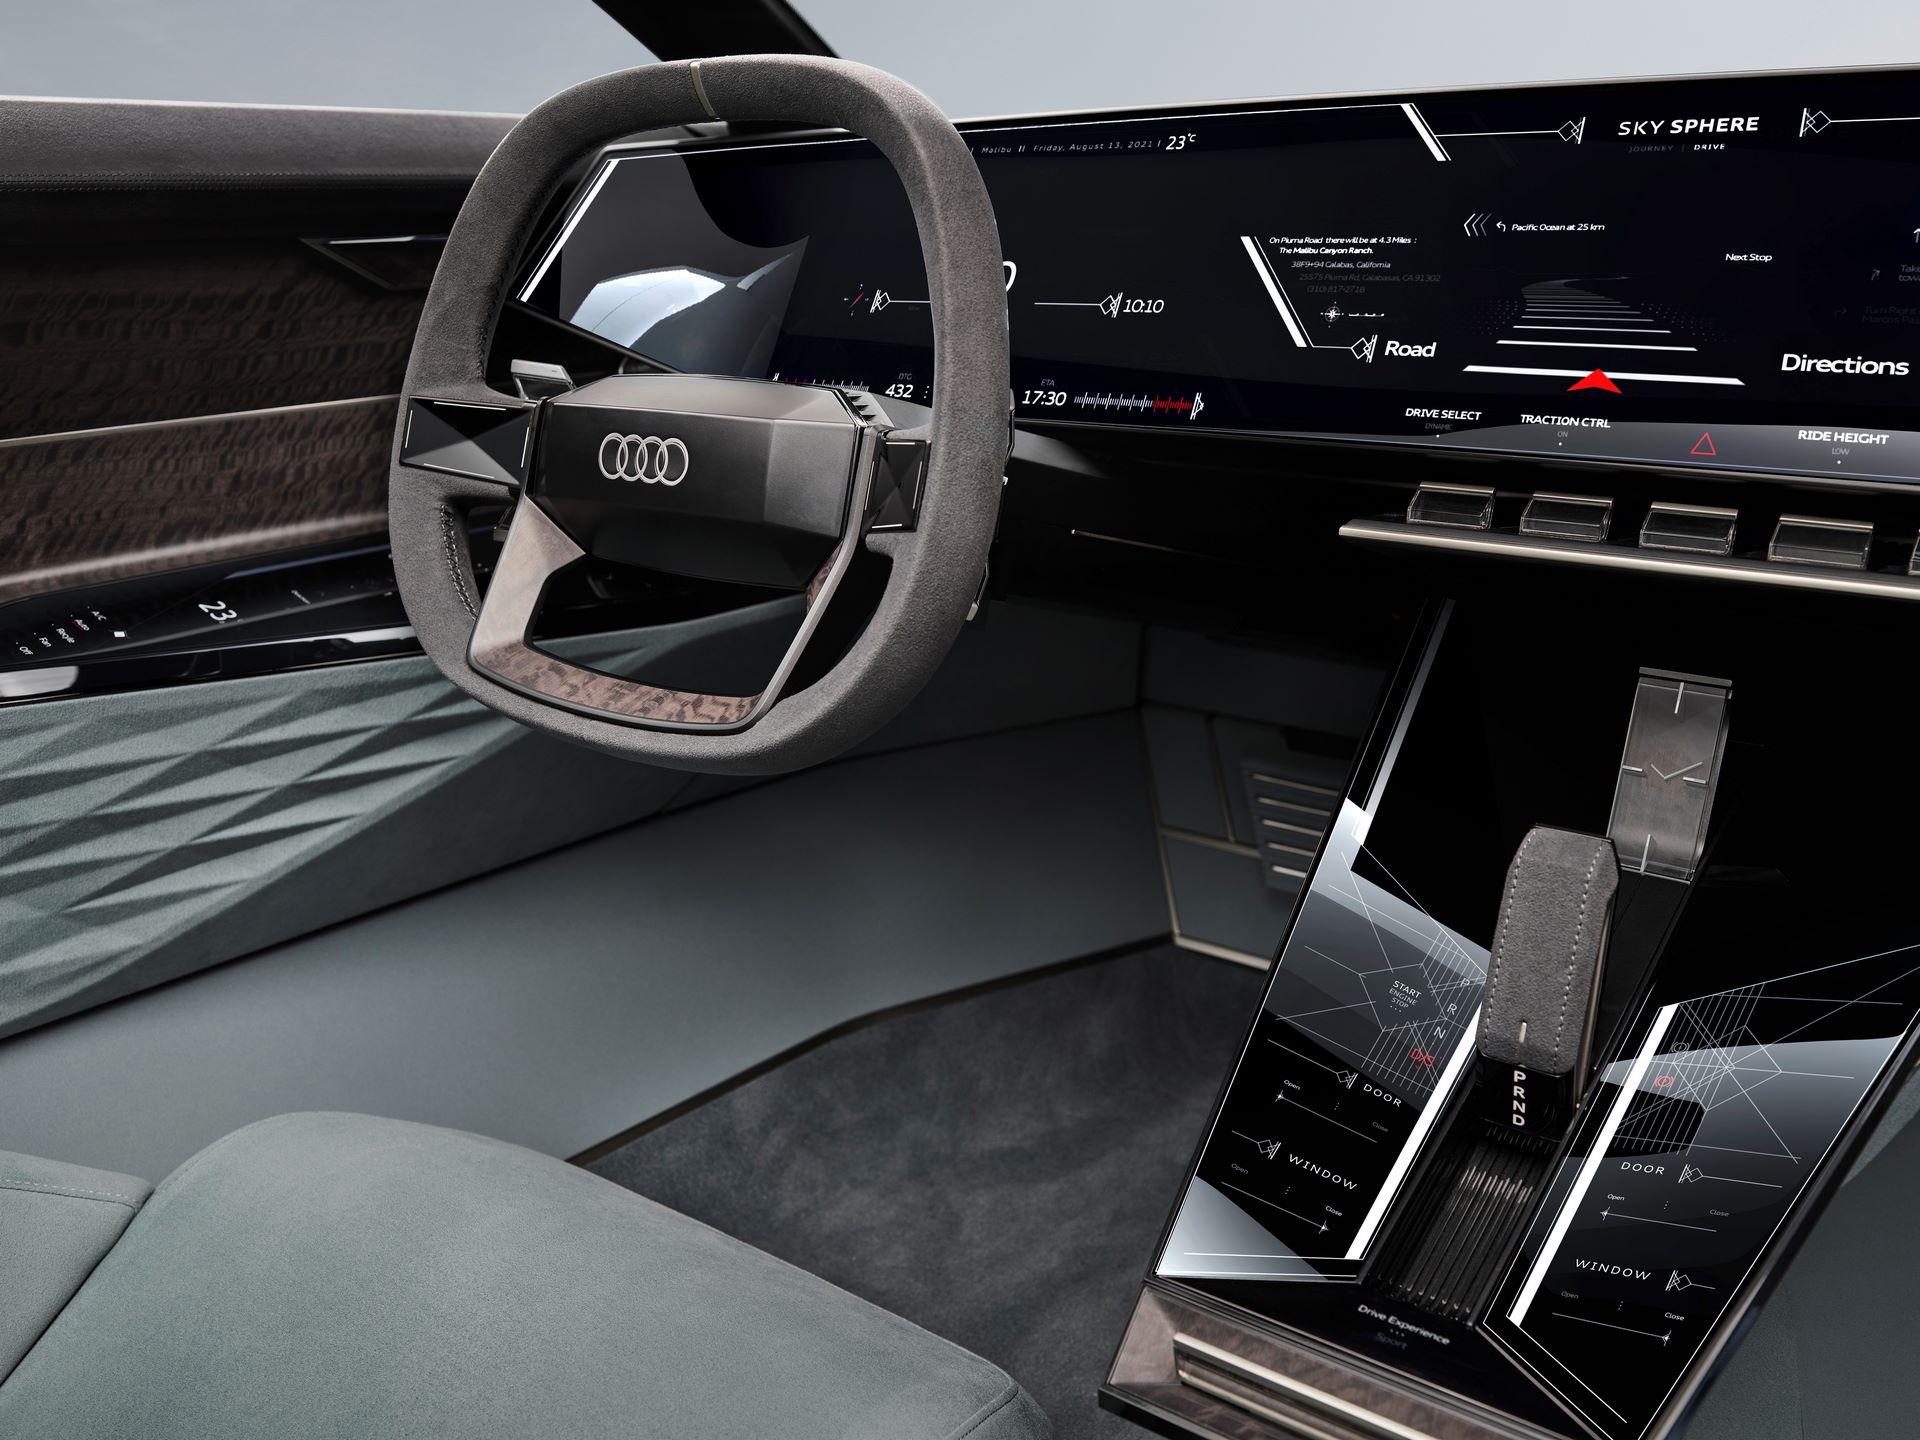 Audi-Skysphere-Concept-70